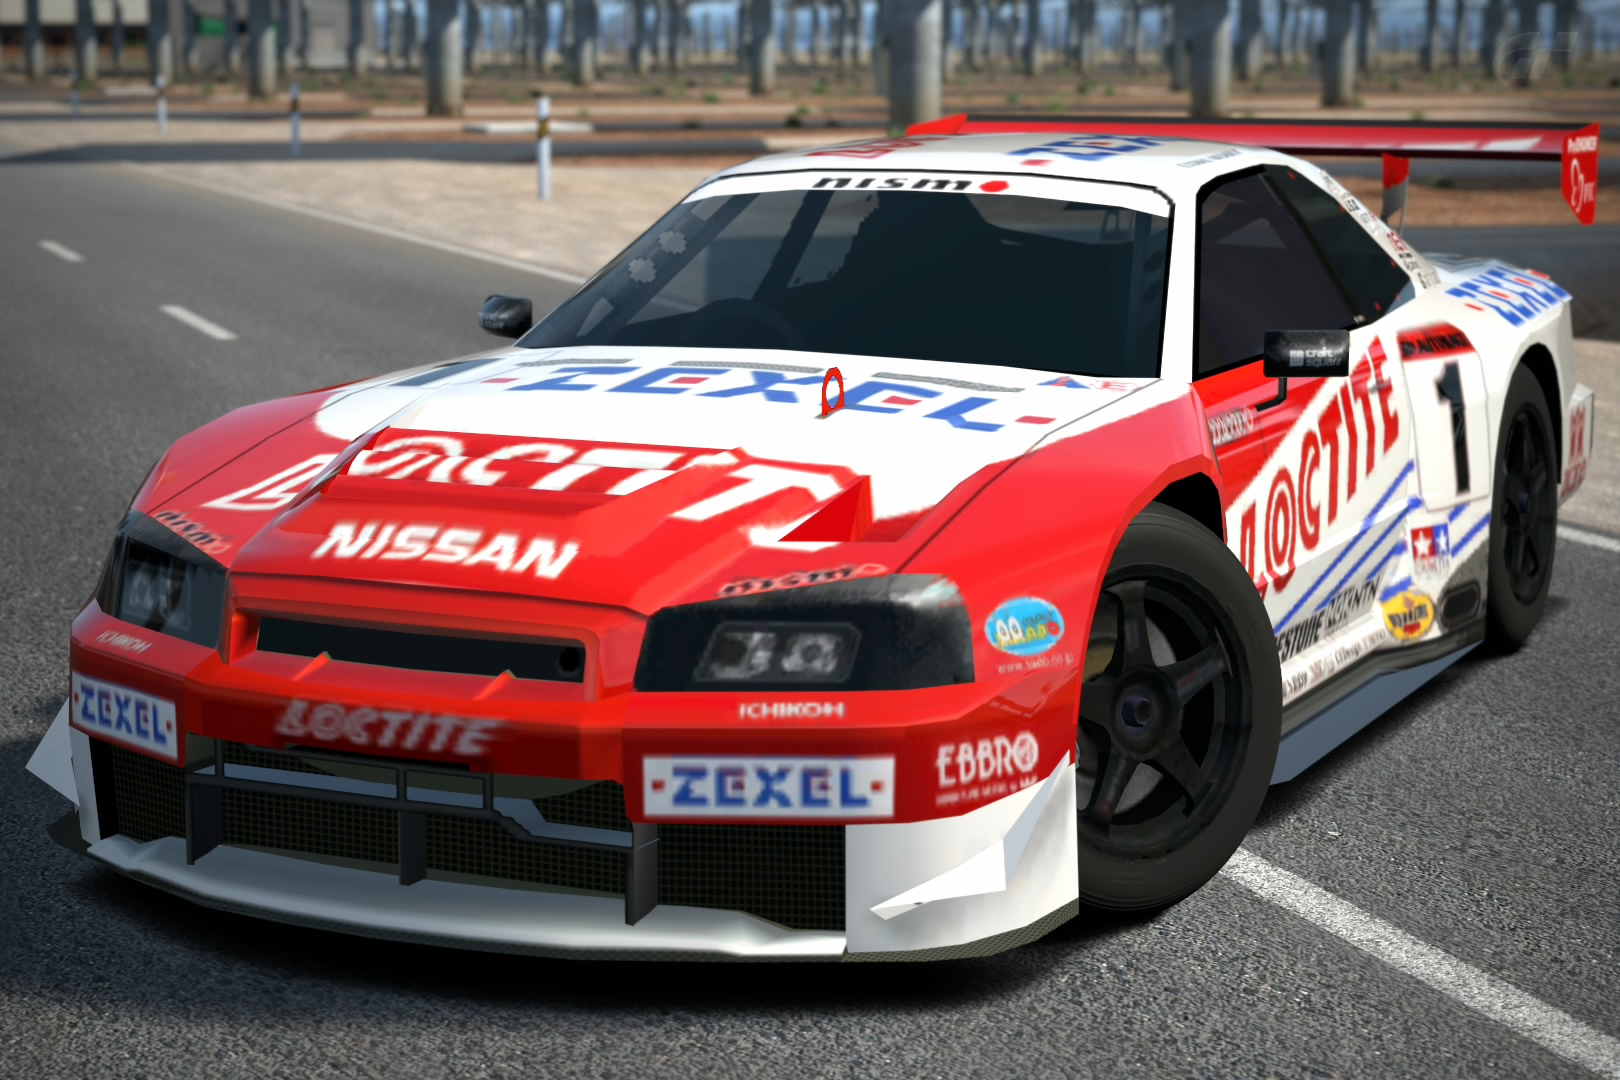 Nissan Loce Zexel Gt R Jgtc 00